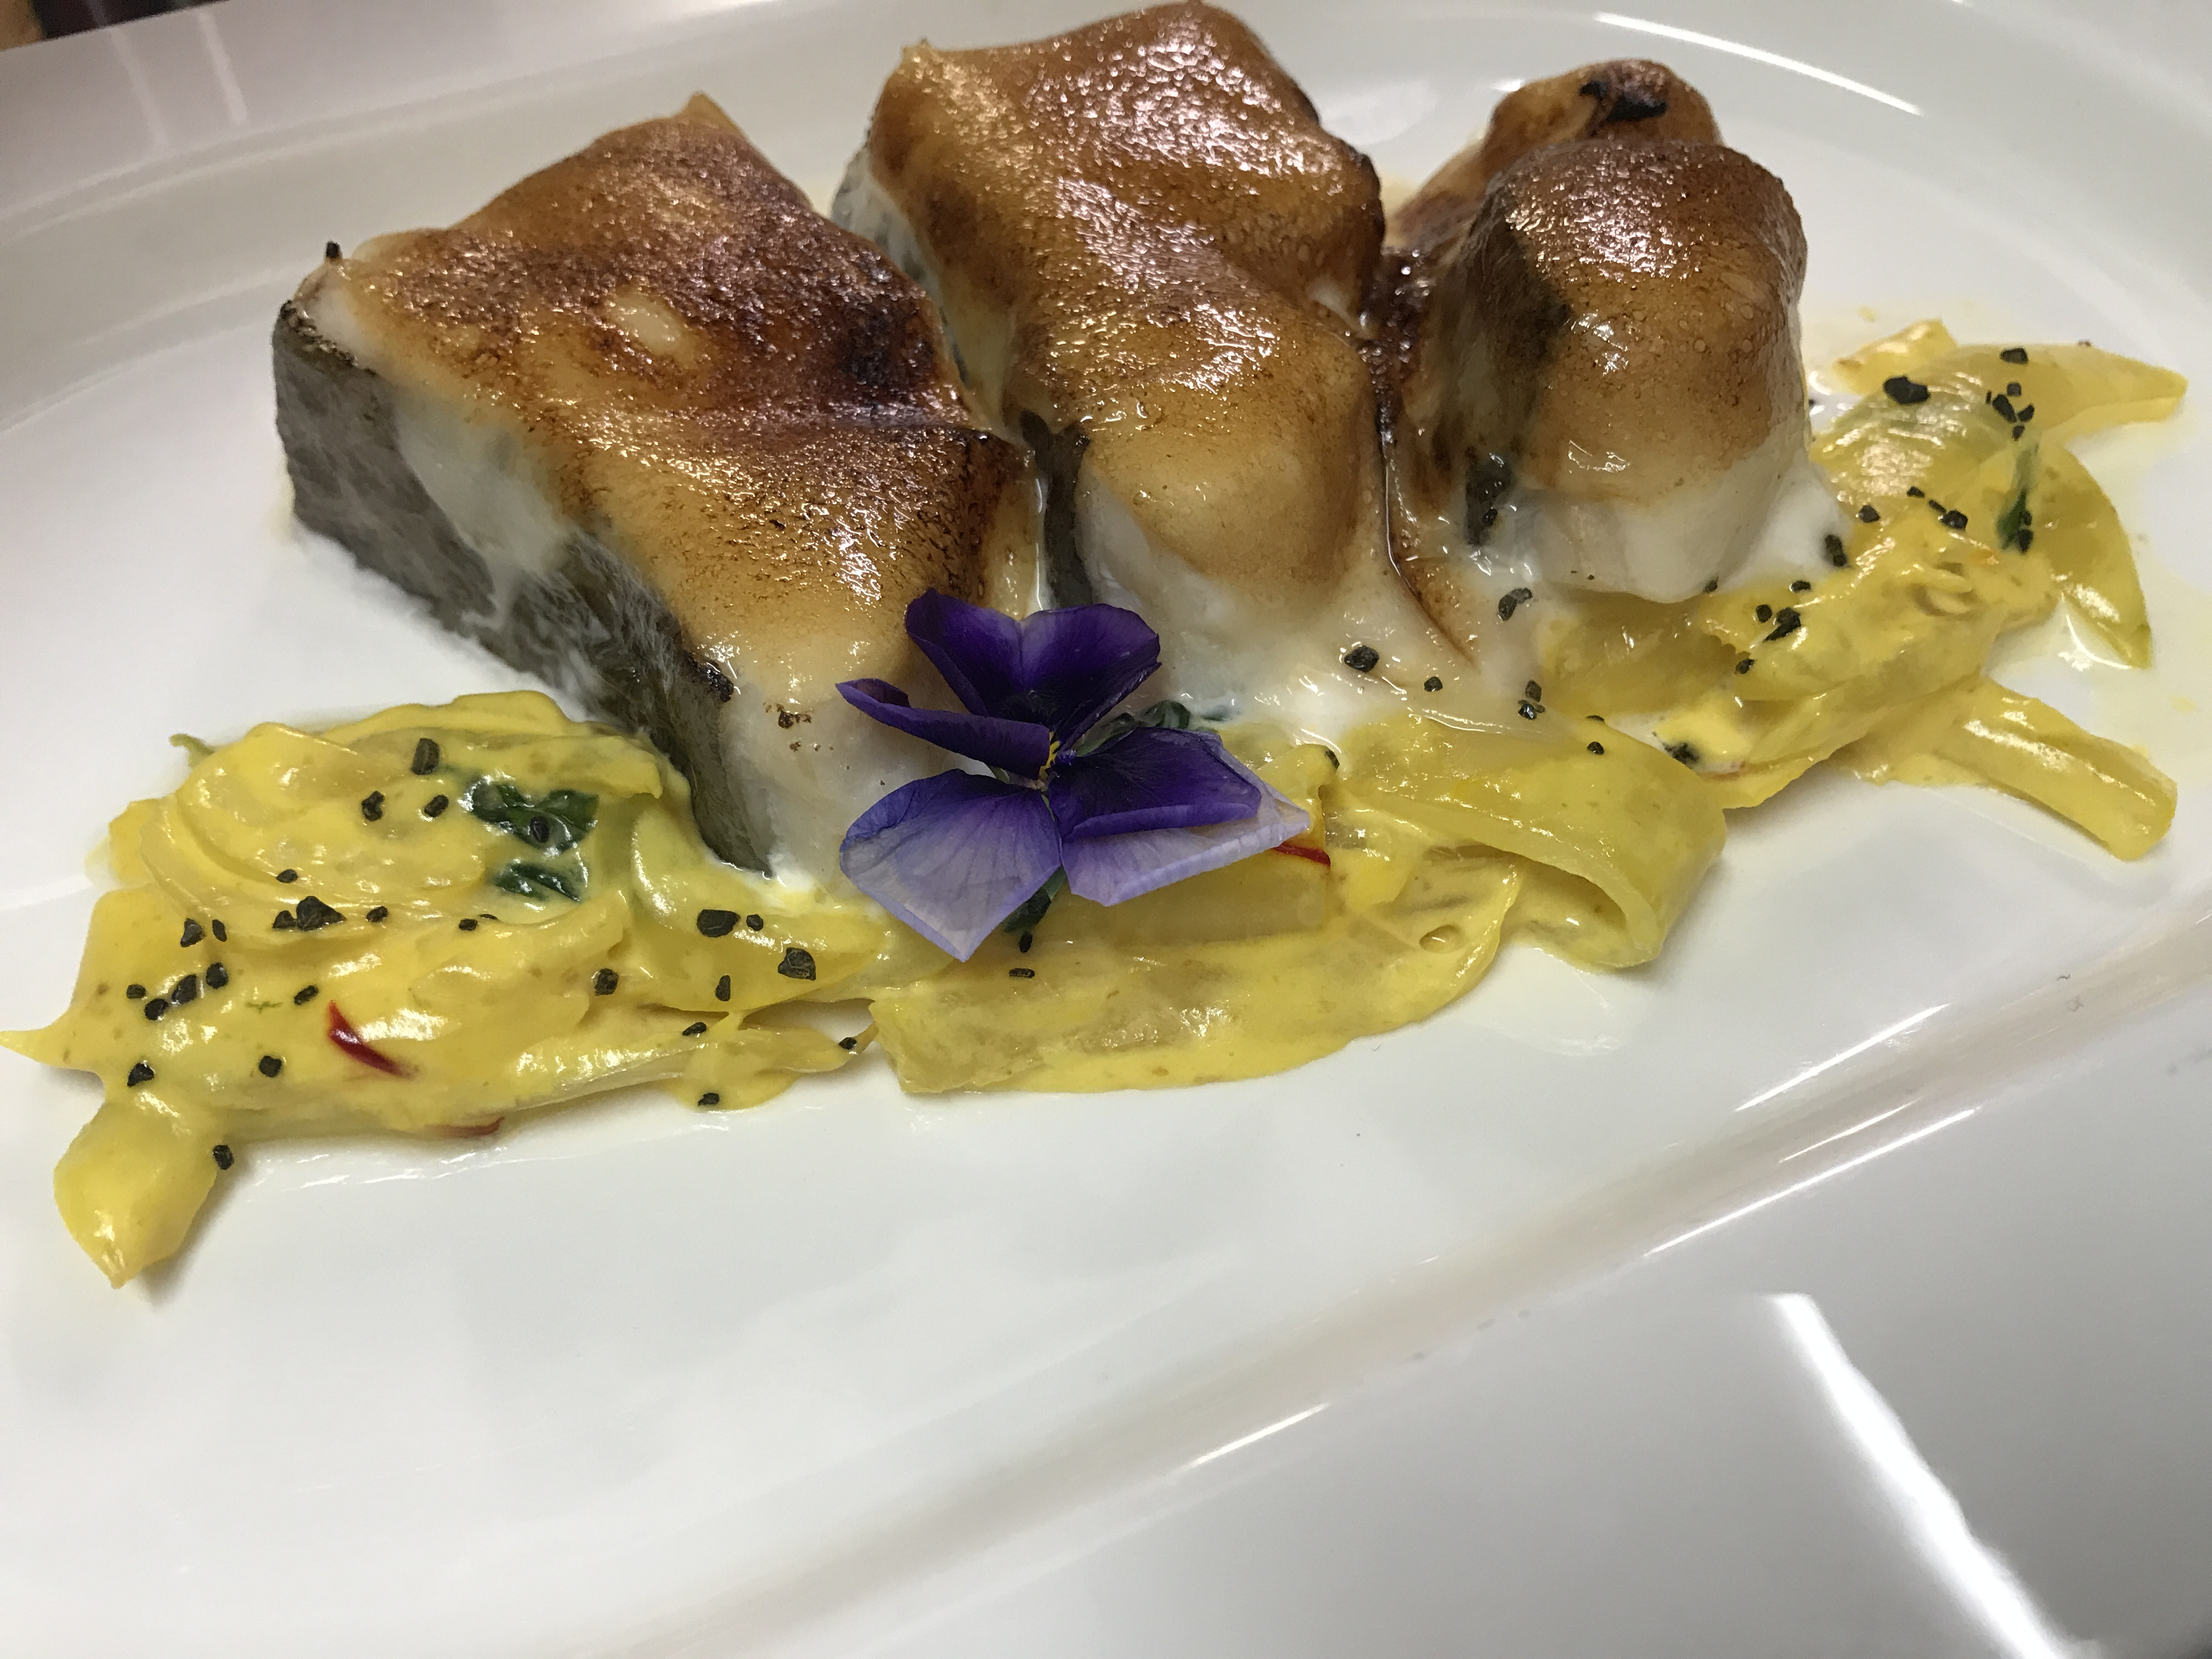 Bacalao al gratén de miel con cebollita asada al azafrán del Jiloca